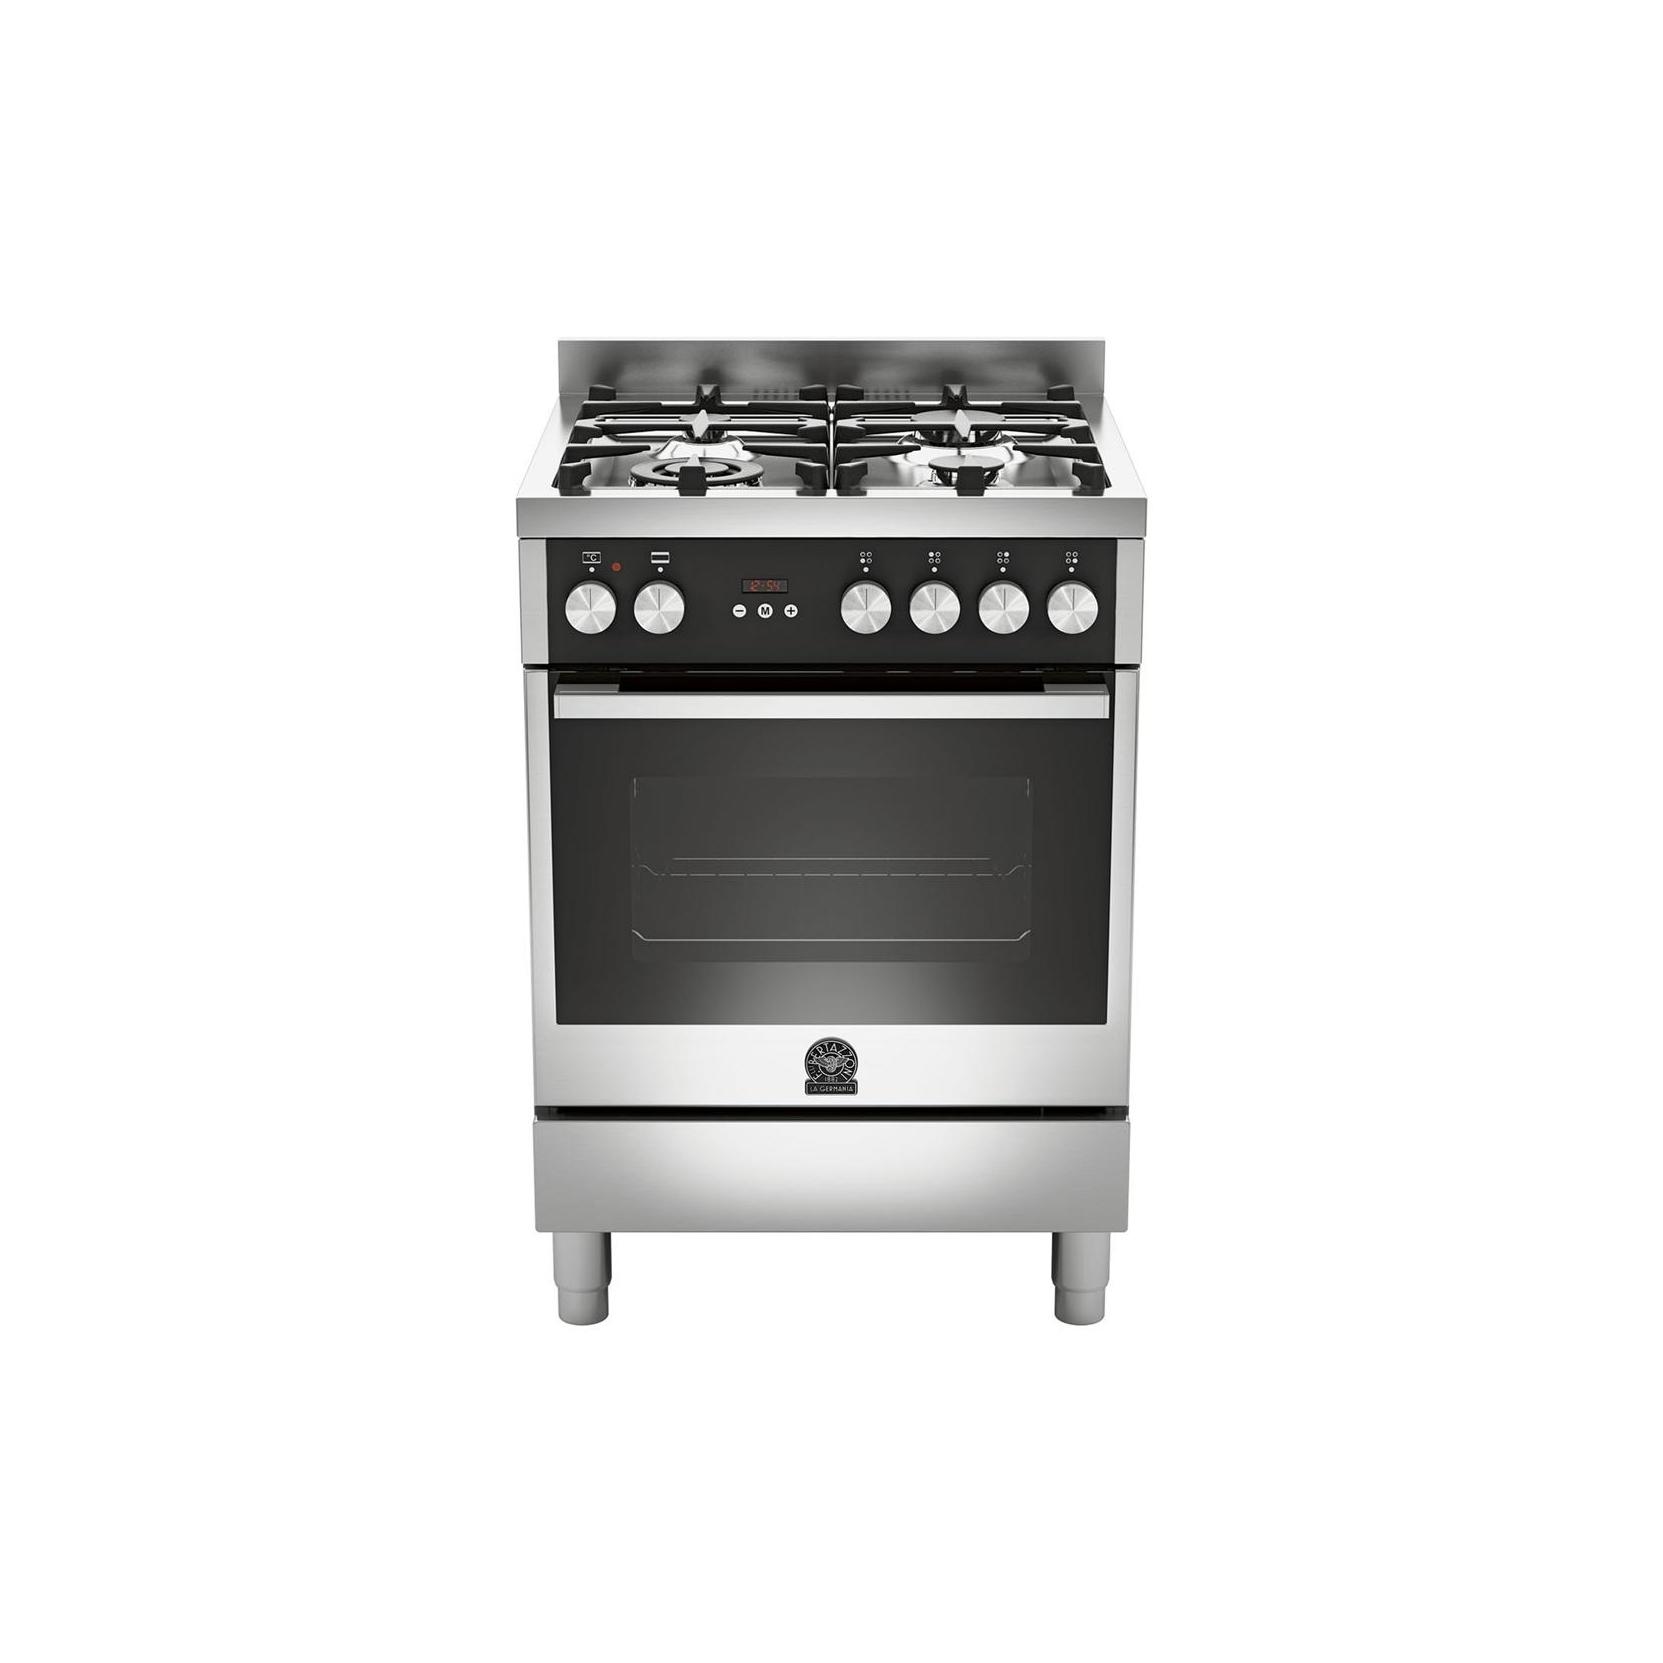 La germania cucina tu64c61bxt 4 fuochi a gas forno elettrico cm 60 x 60 inox garanzia italia - Cucine a gas la germania ...